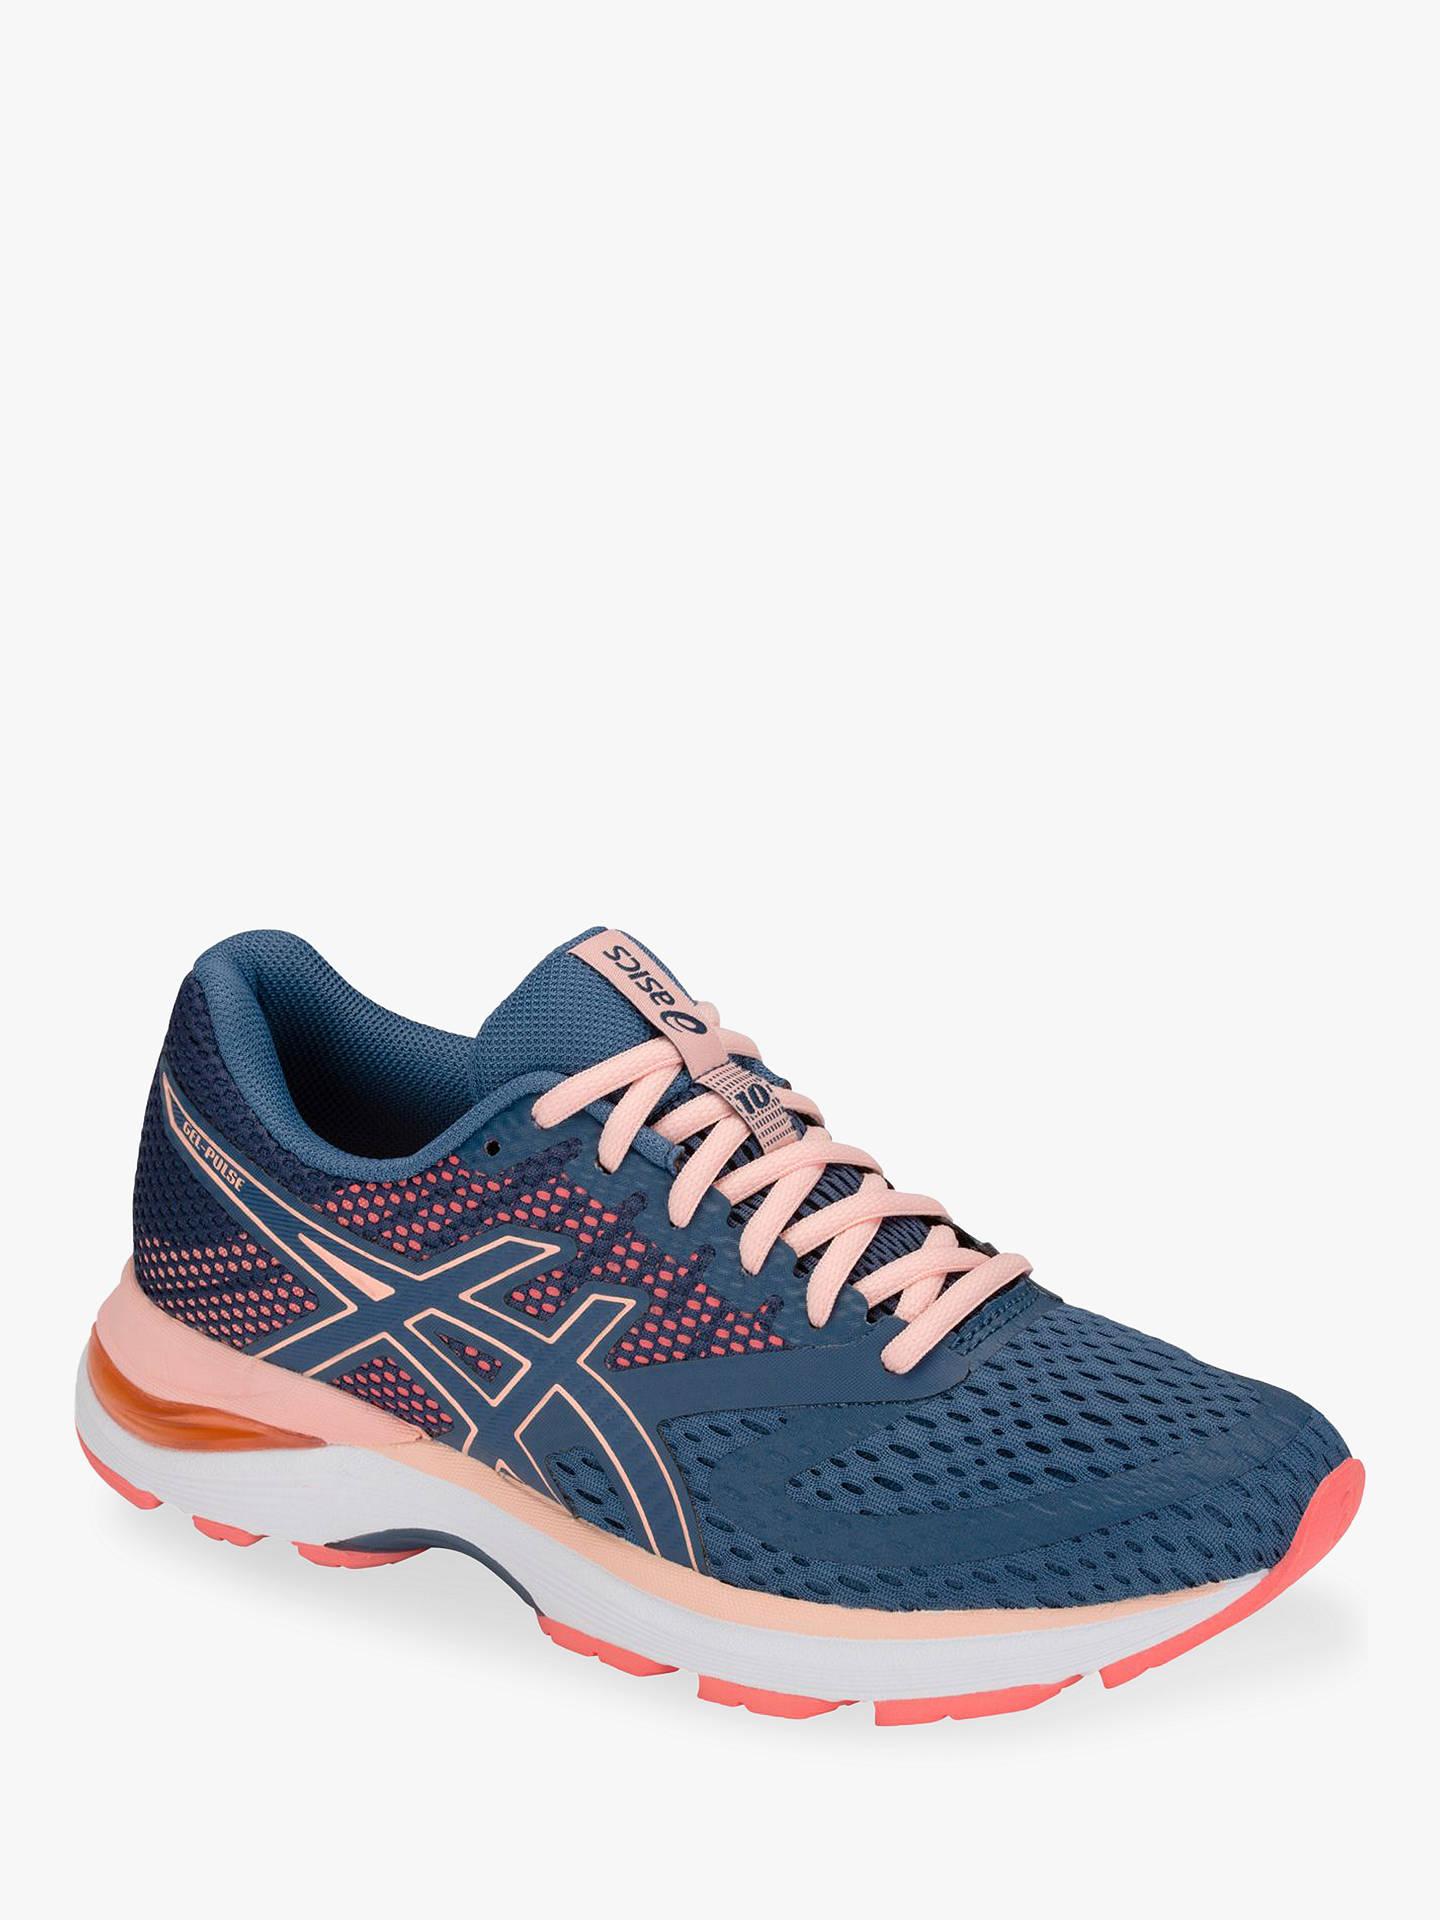 534576dff91 ASICS GEL-PULSE 10 Women s Running Shoes at John Lewis   Partners